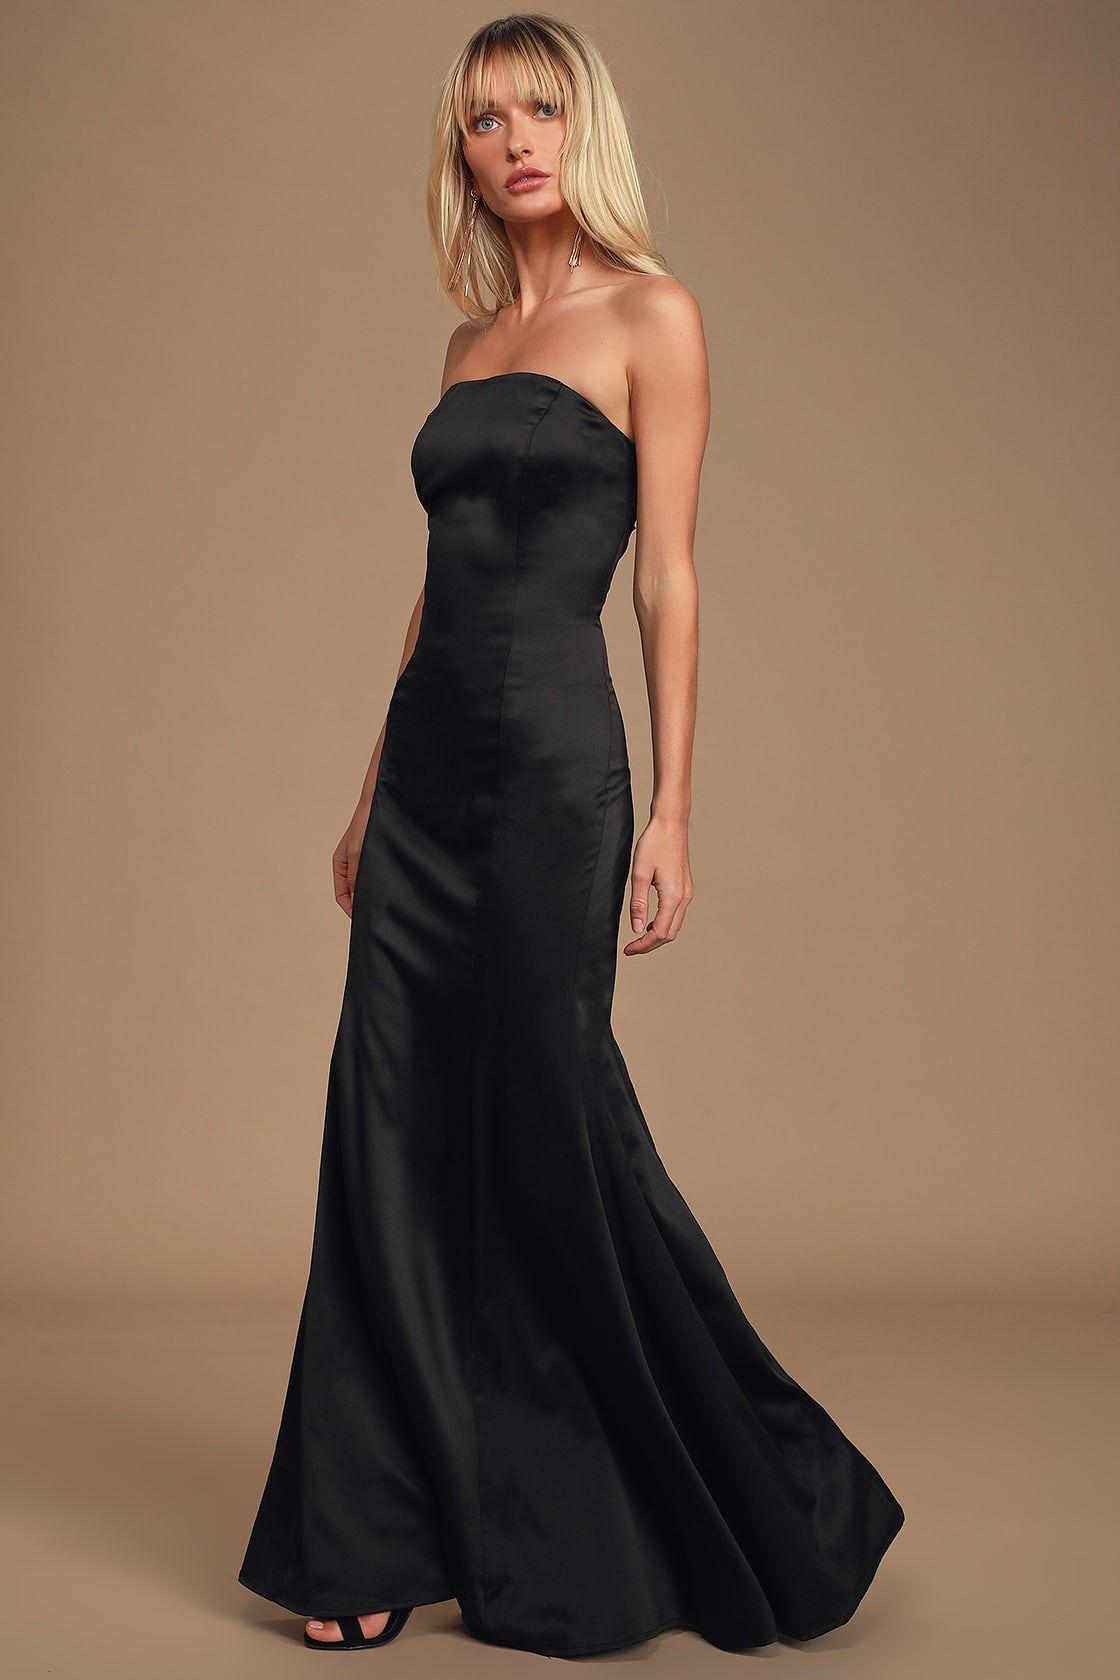 Hearts Run Wild Black Satin Strapless Maxi Dress Dresses Strapless Maxi Dress Strapless Dress Formal [ 1680 x 1120 Pixel ]